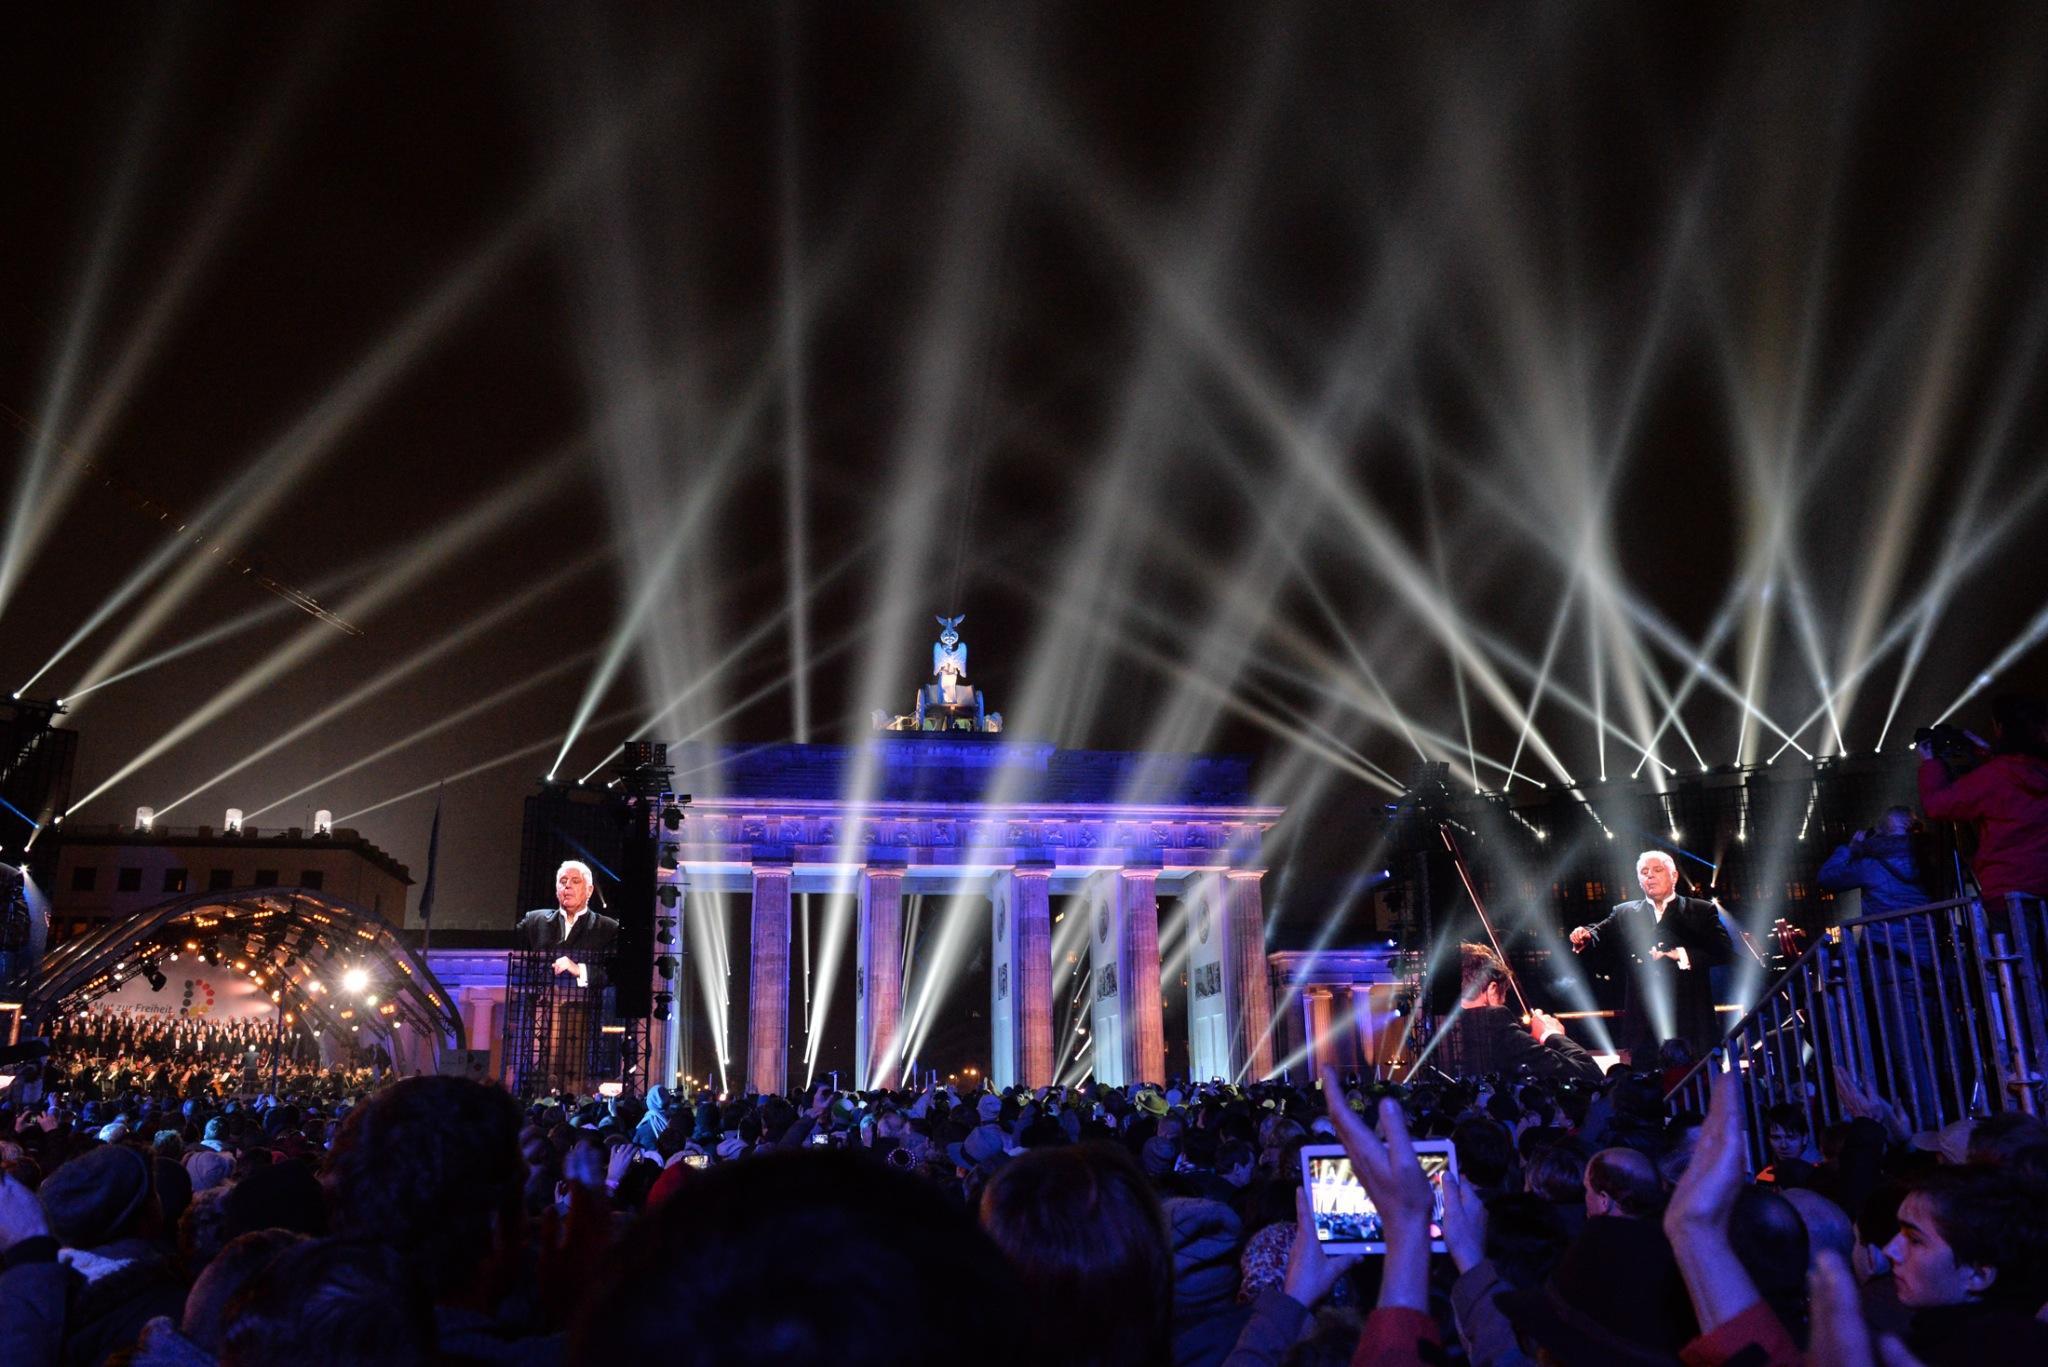 Brandenburg Tor 2014-NOV-09